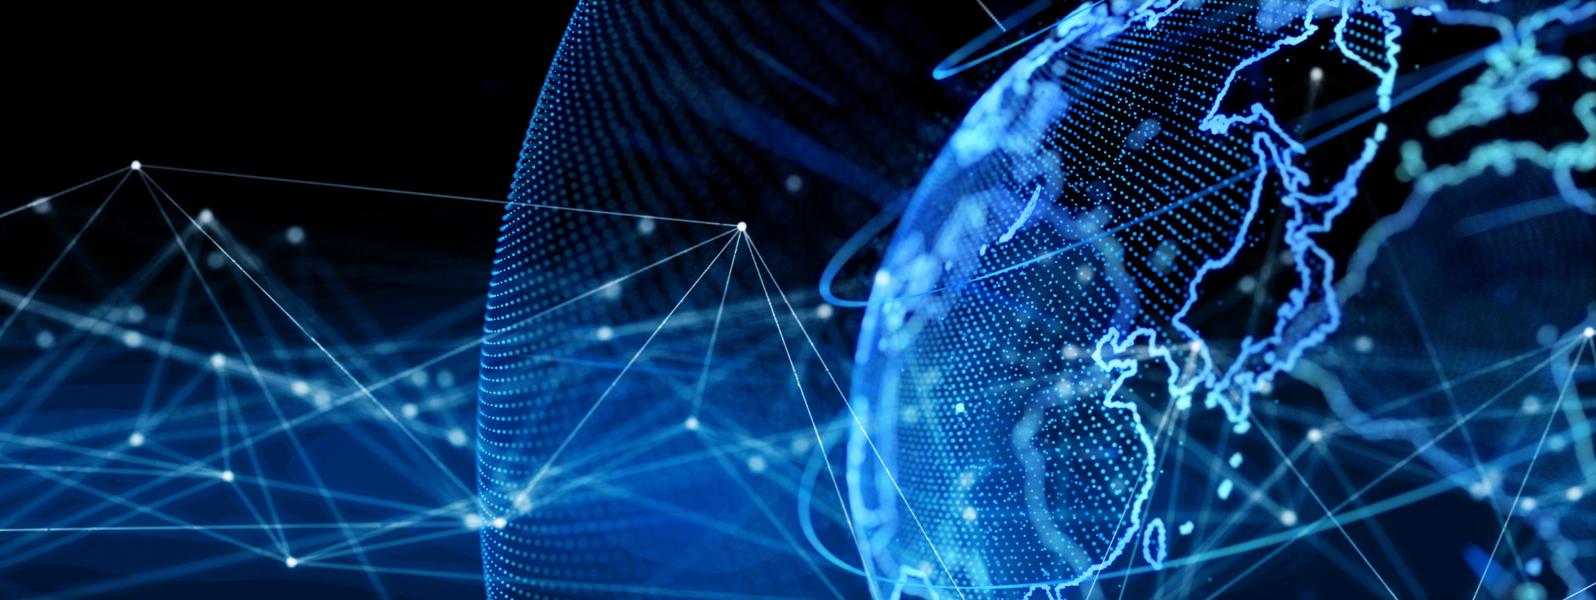 myairops fbo's integration with Eurocontrol header image